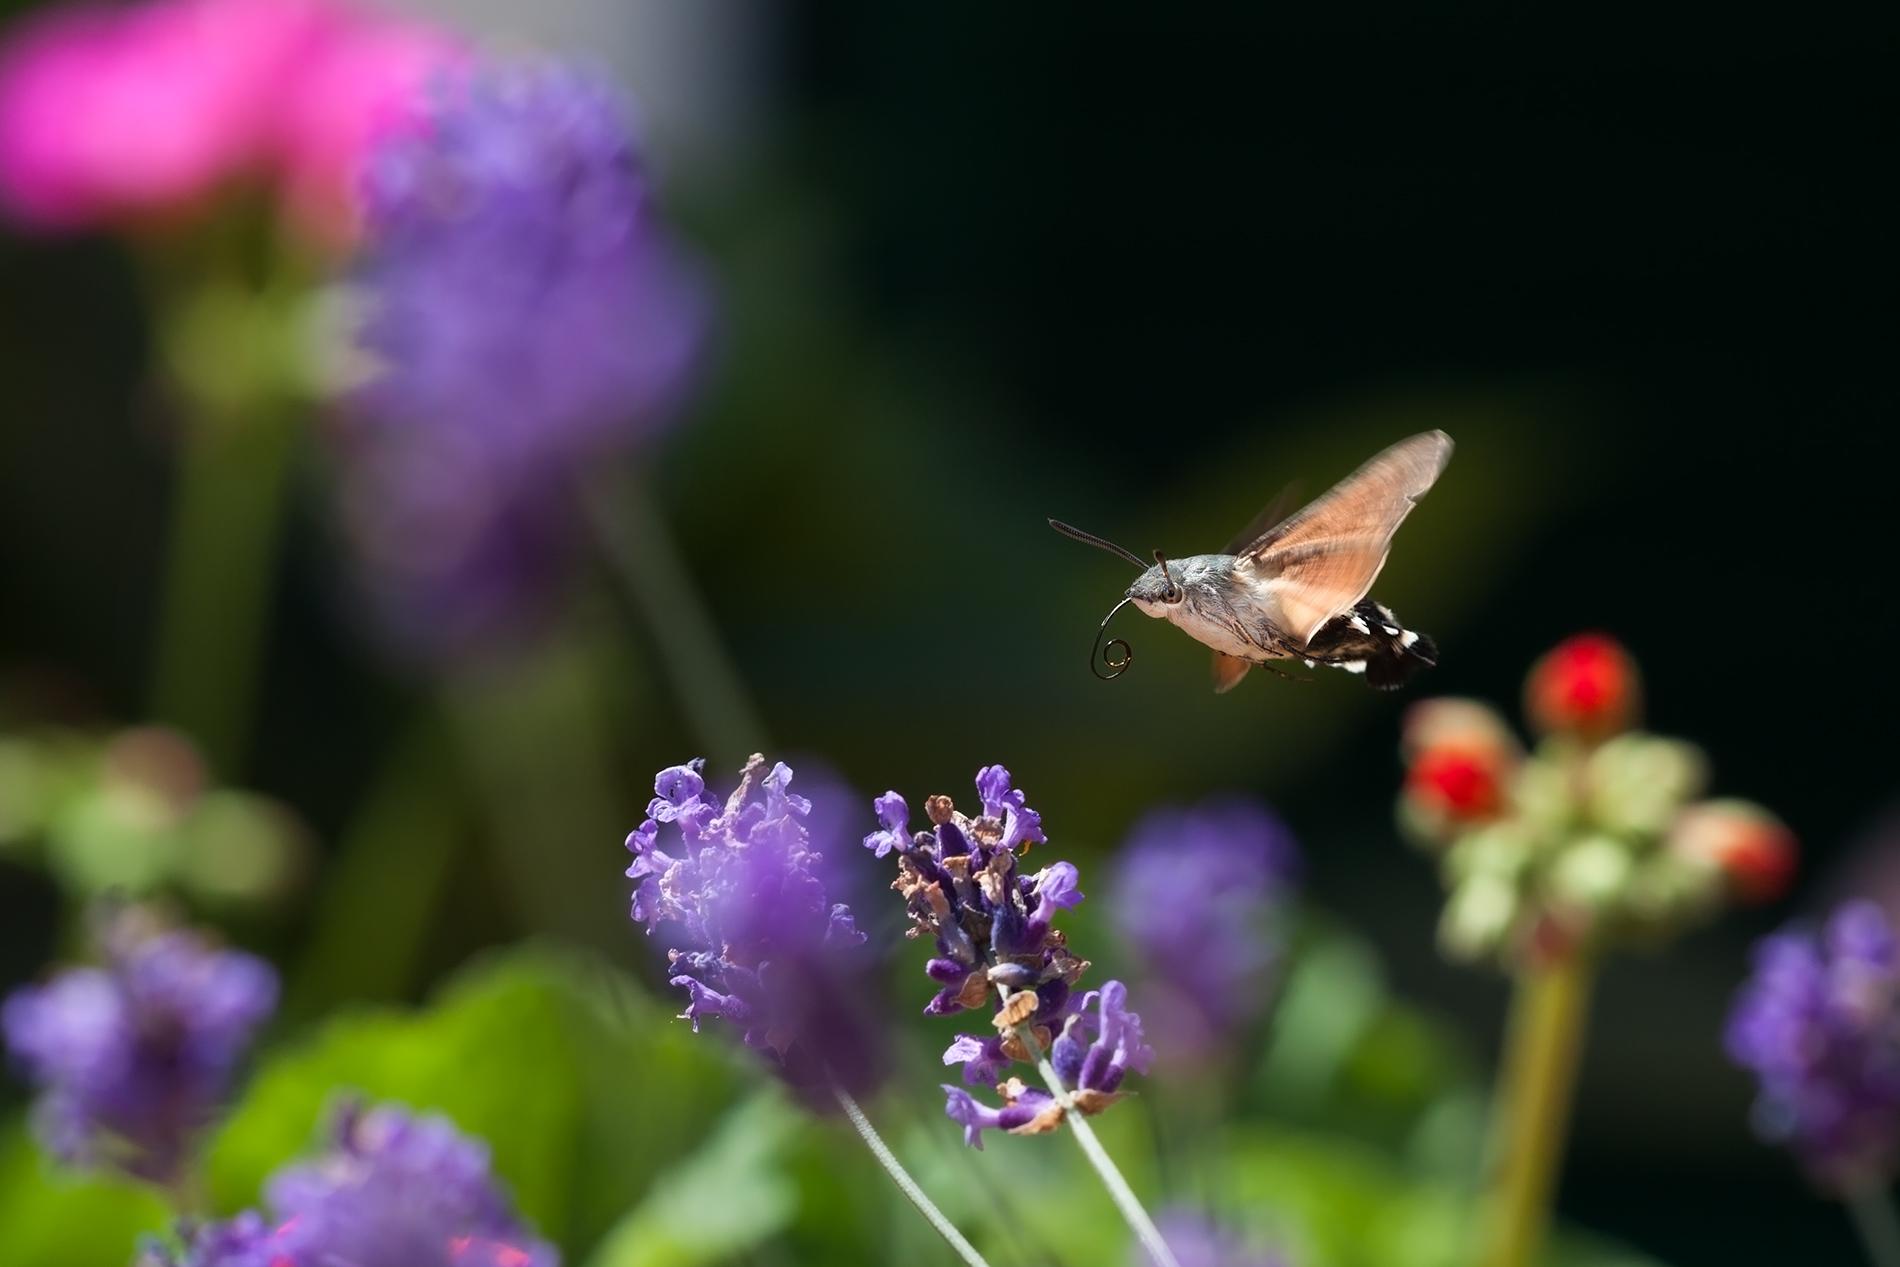 macroglossum in flight...